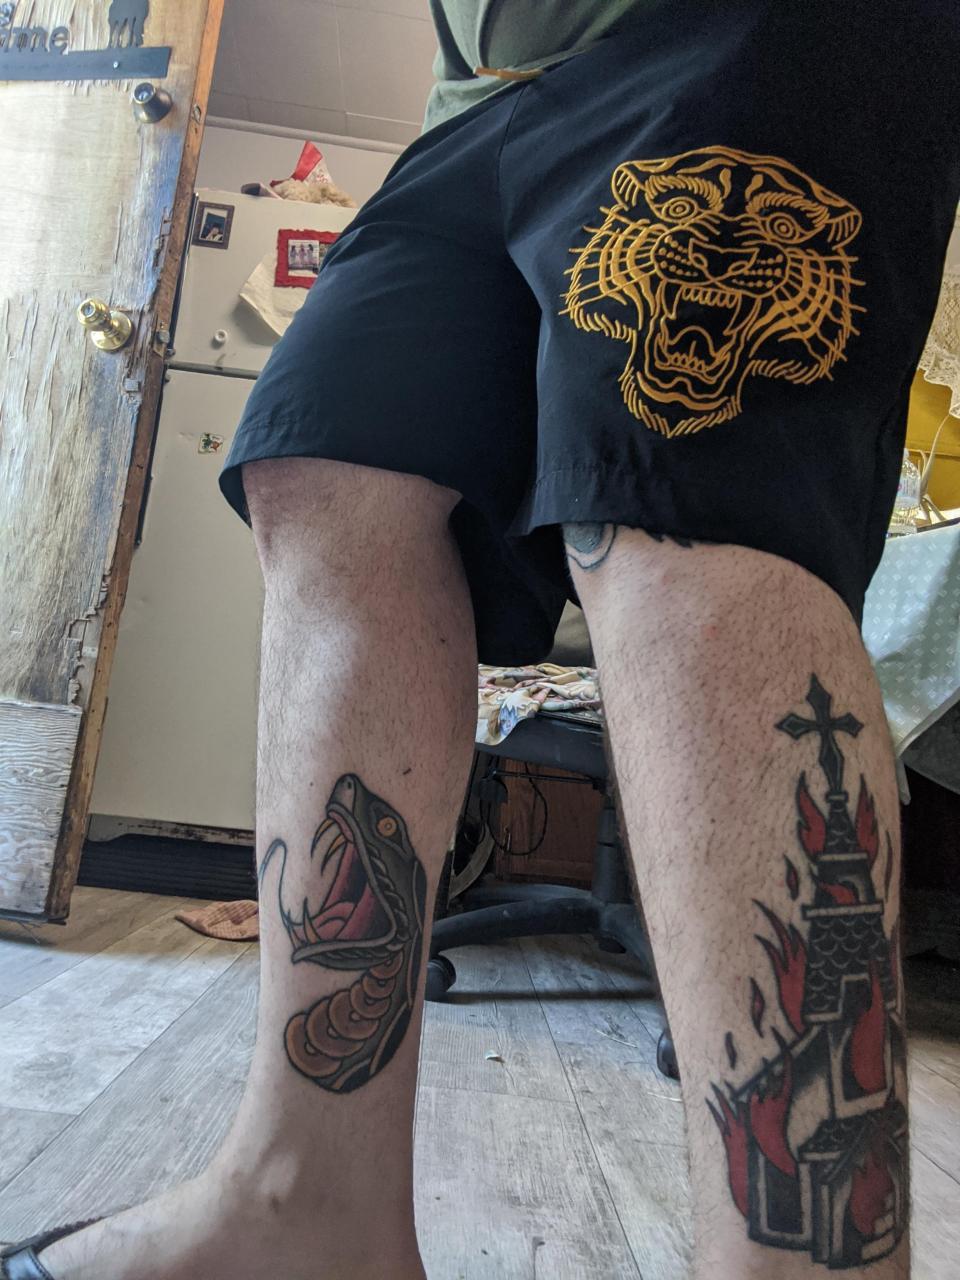 Here are my legs by B. Huntington Rites of Passage/Saskatoon CA